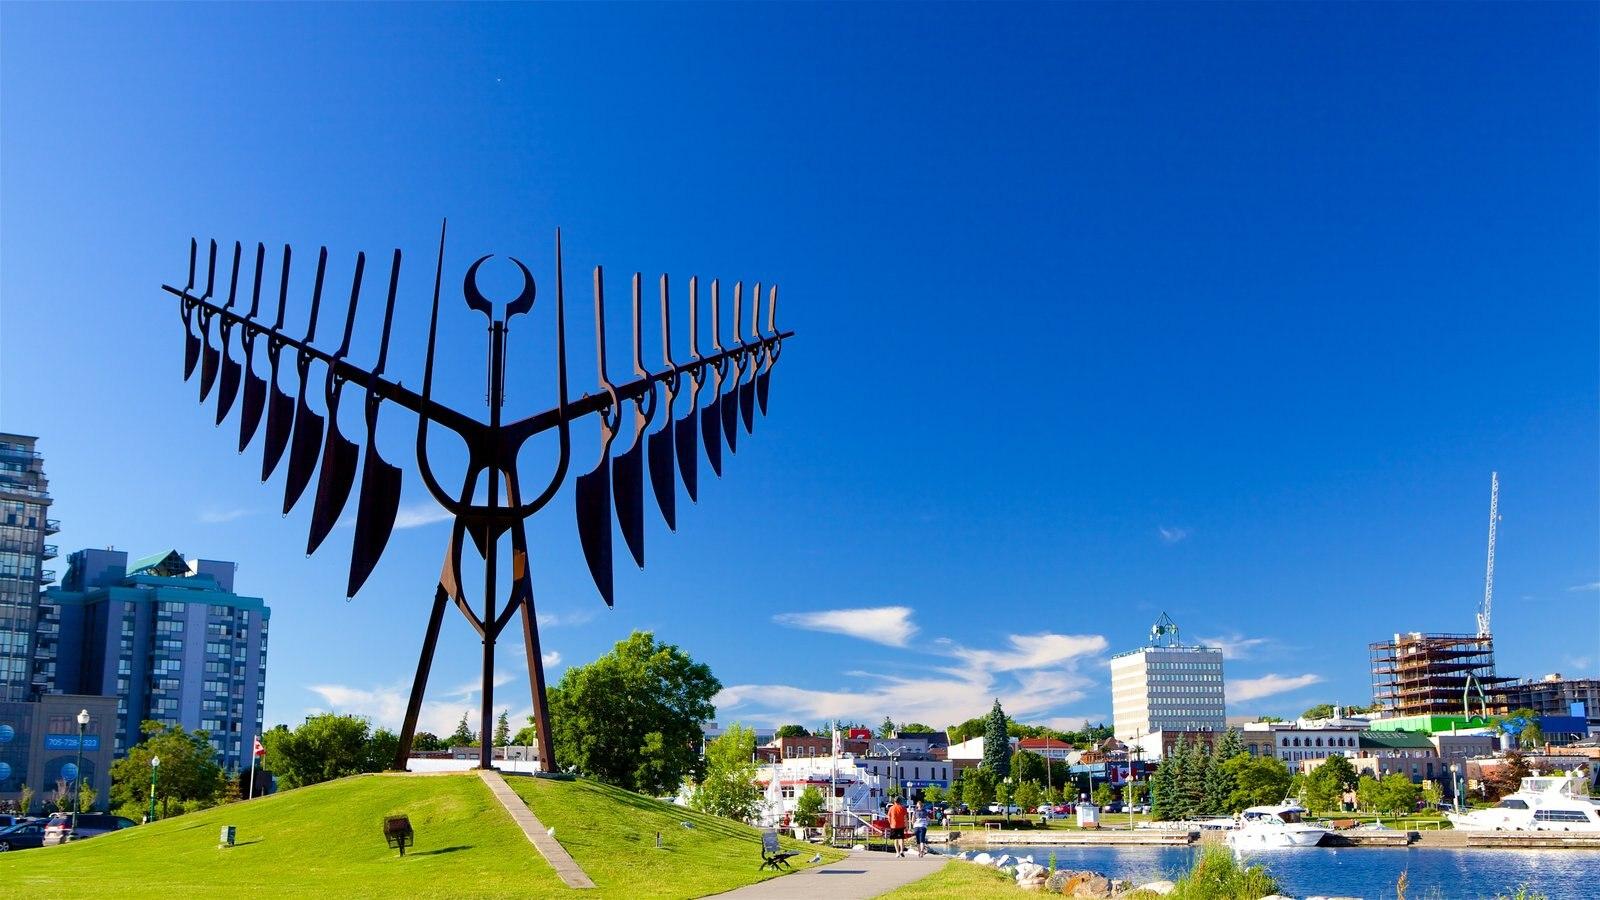 Barrie - Orillia ofreciendo arte y arte al aire libre